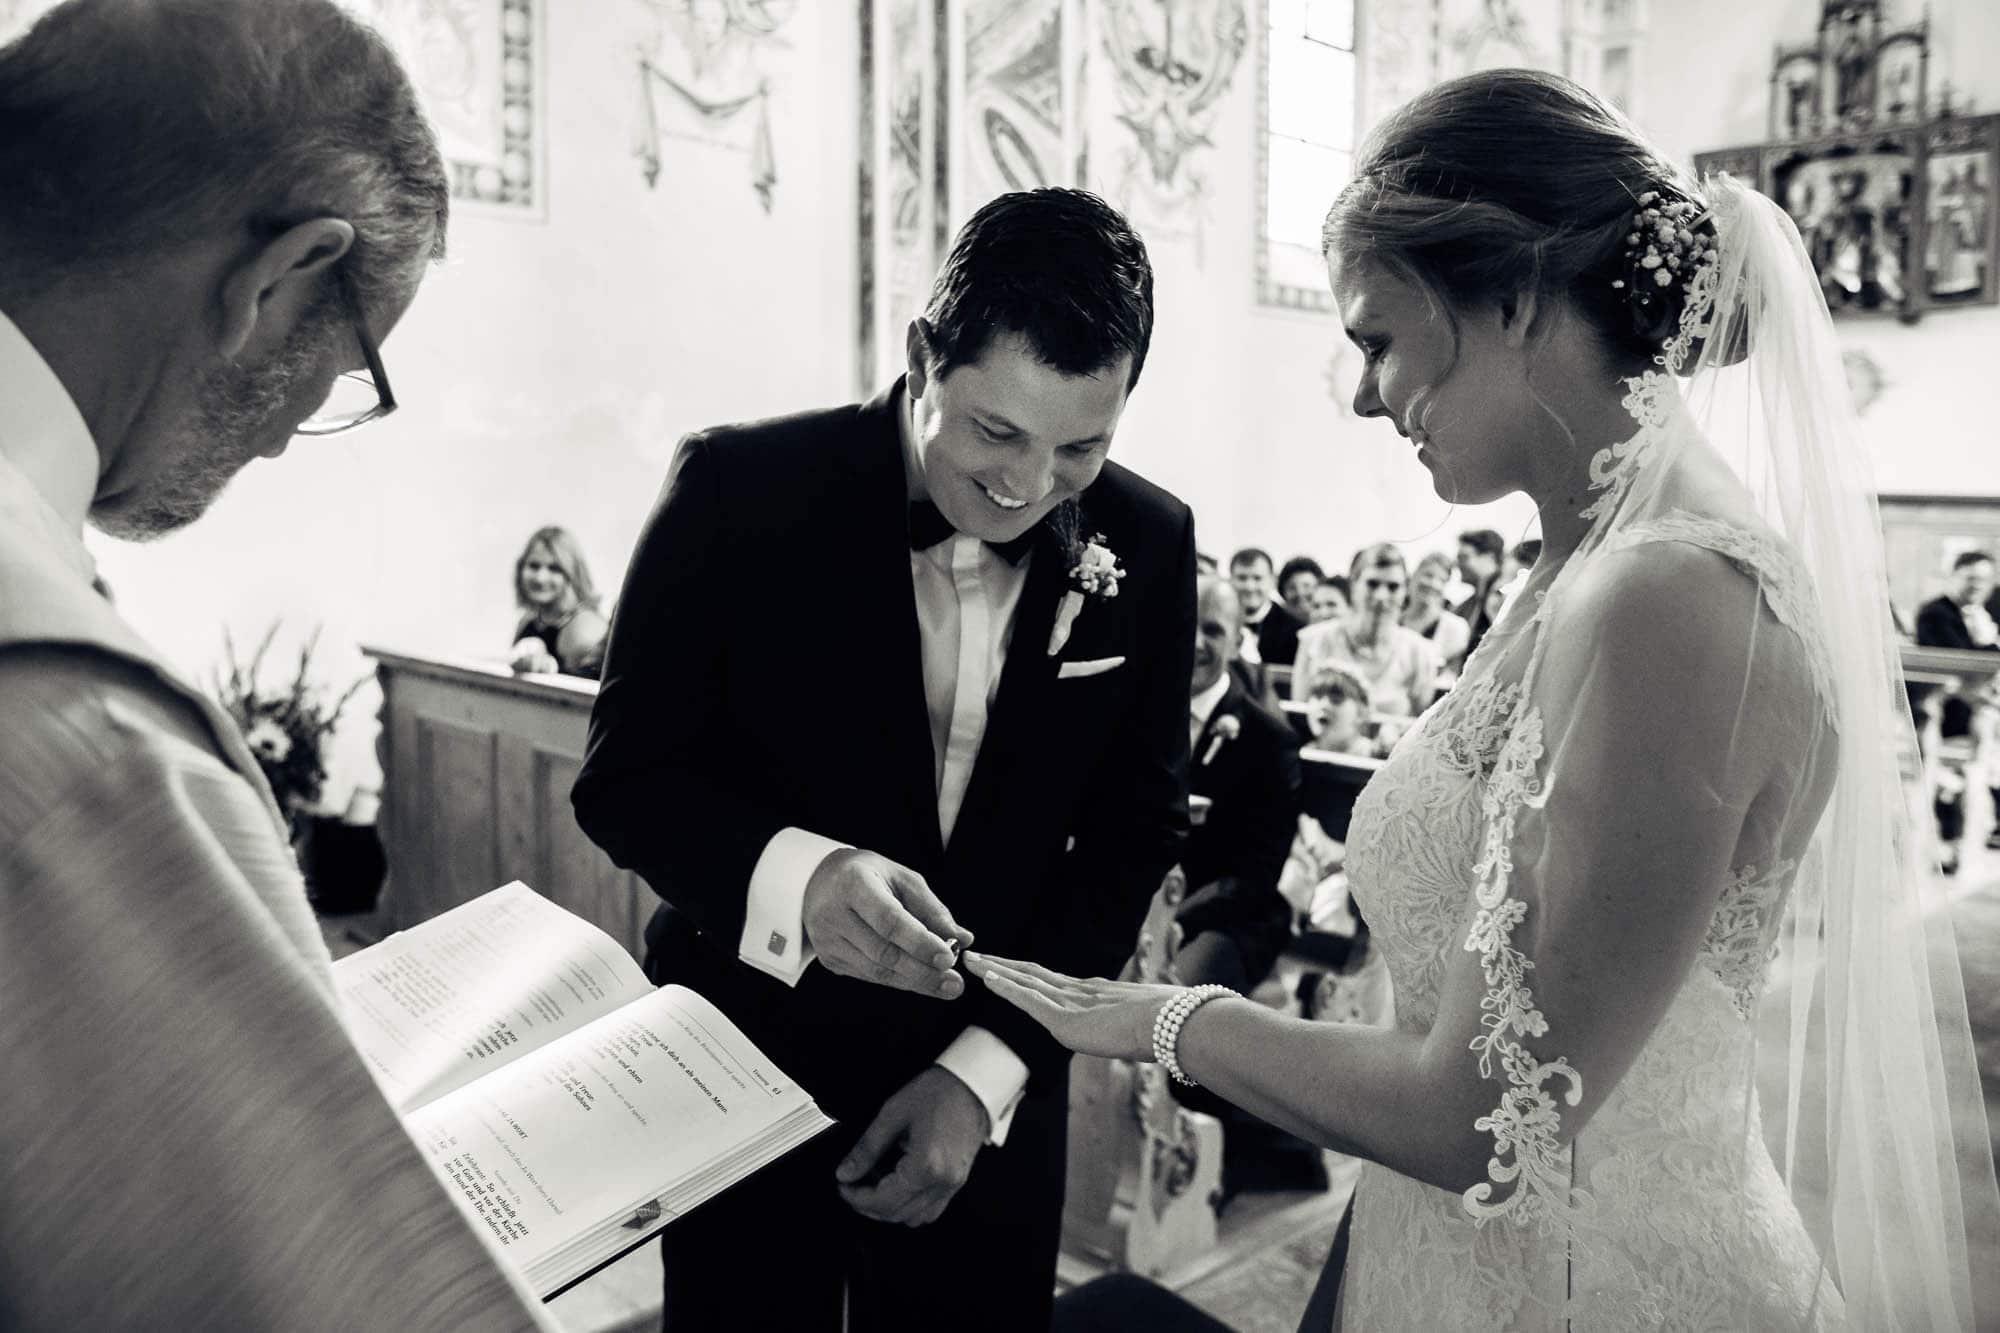 Bräutigam steckt der Braut den Ehering an